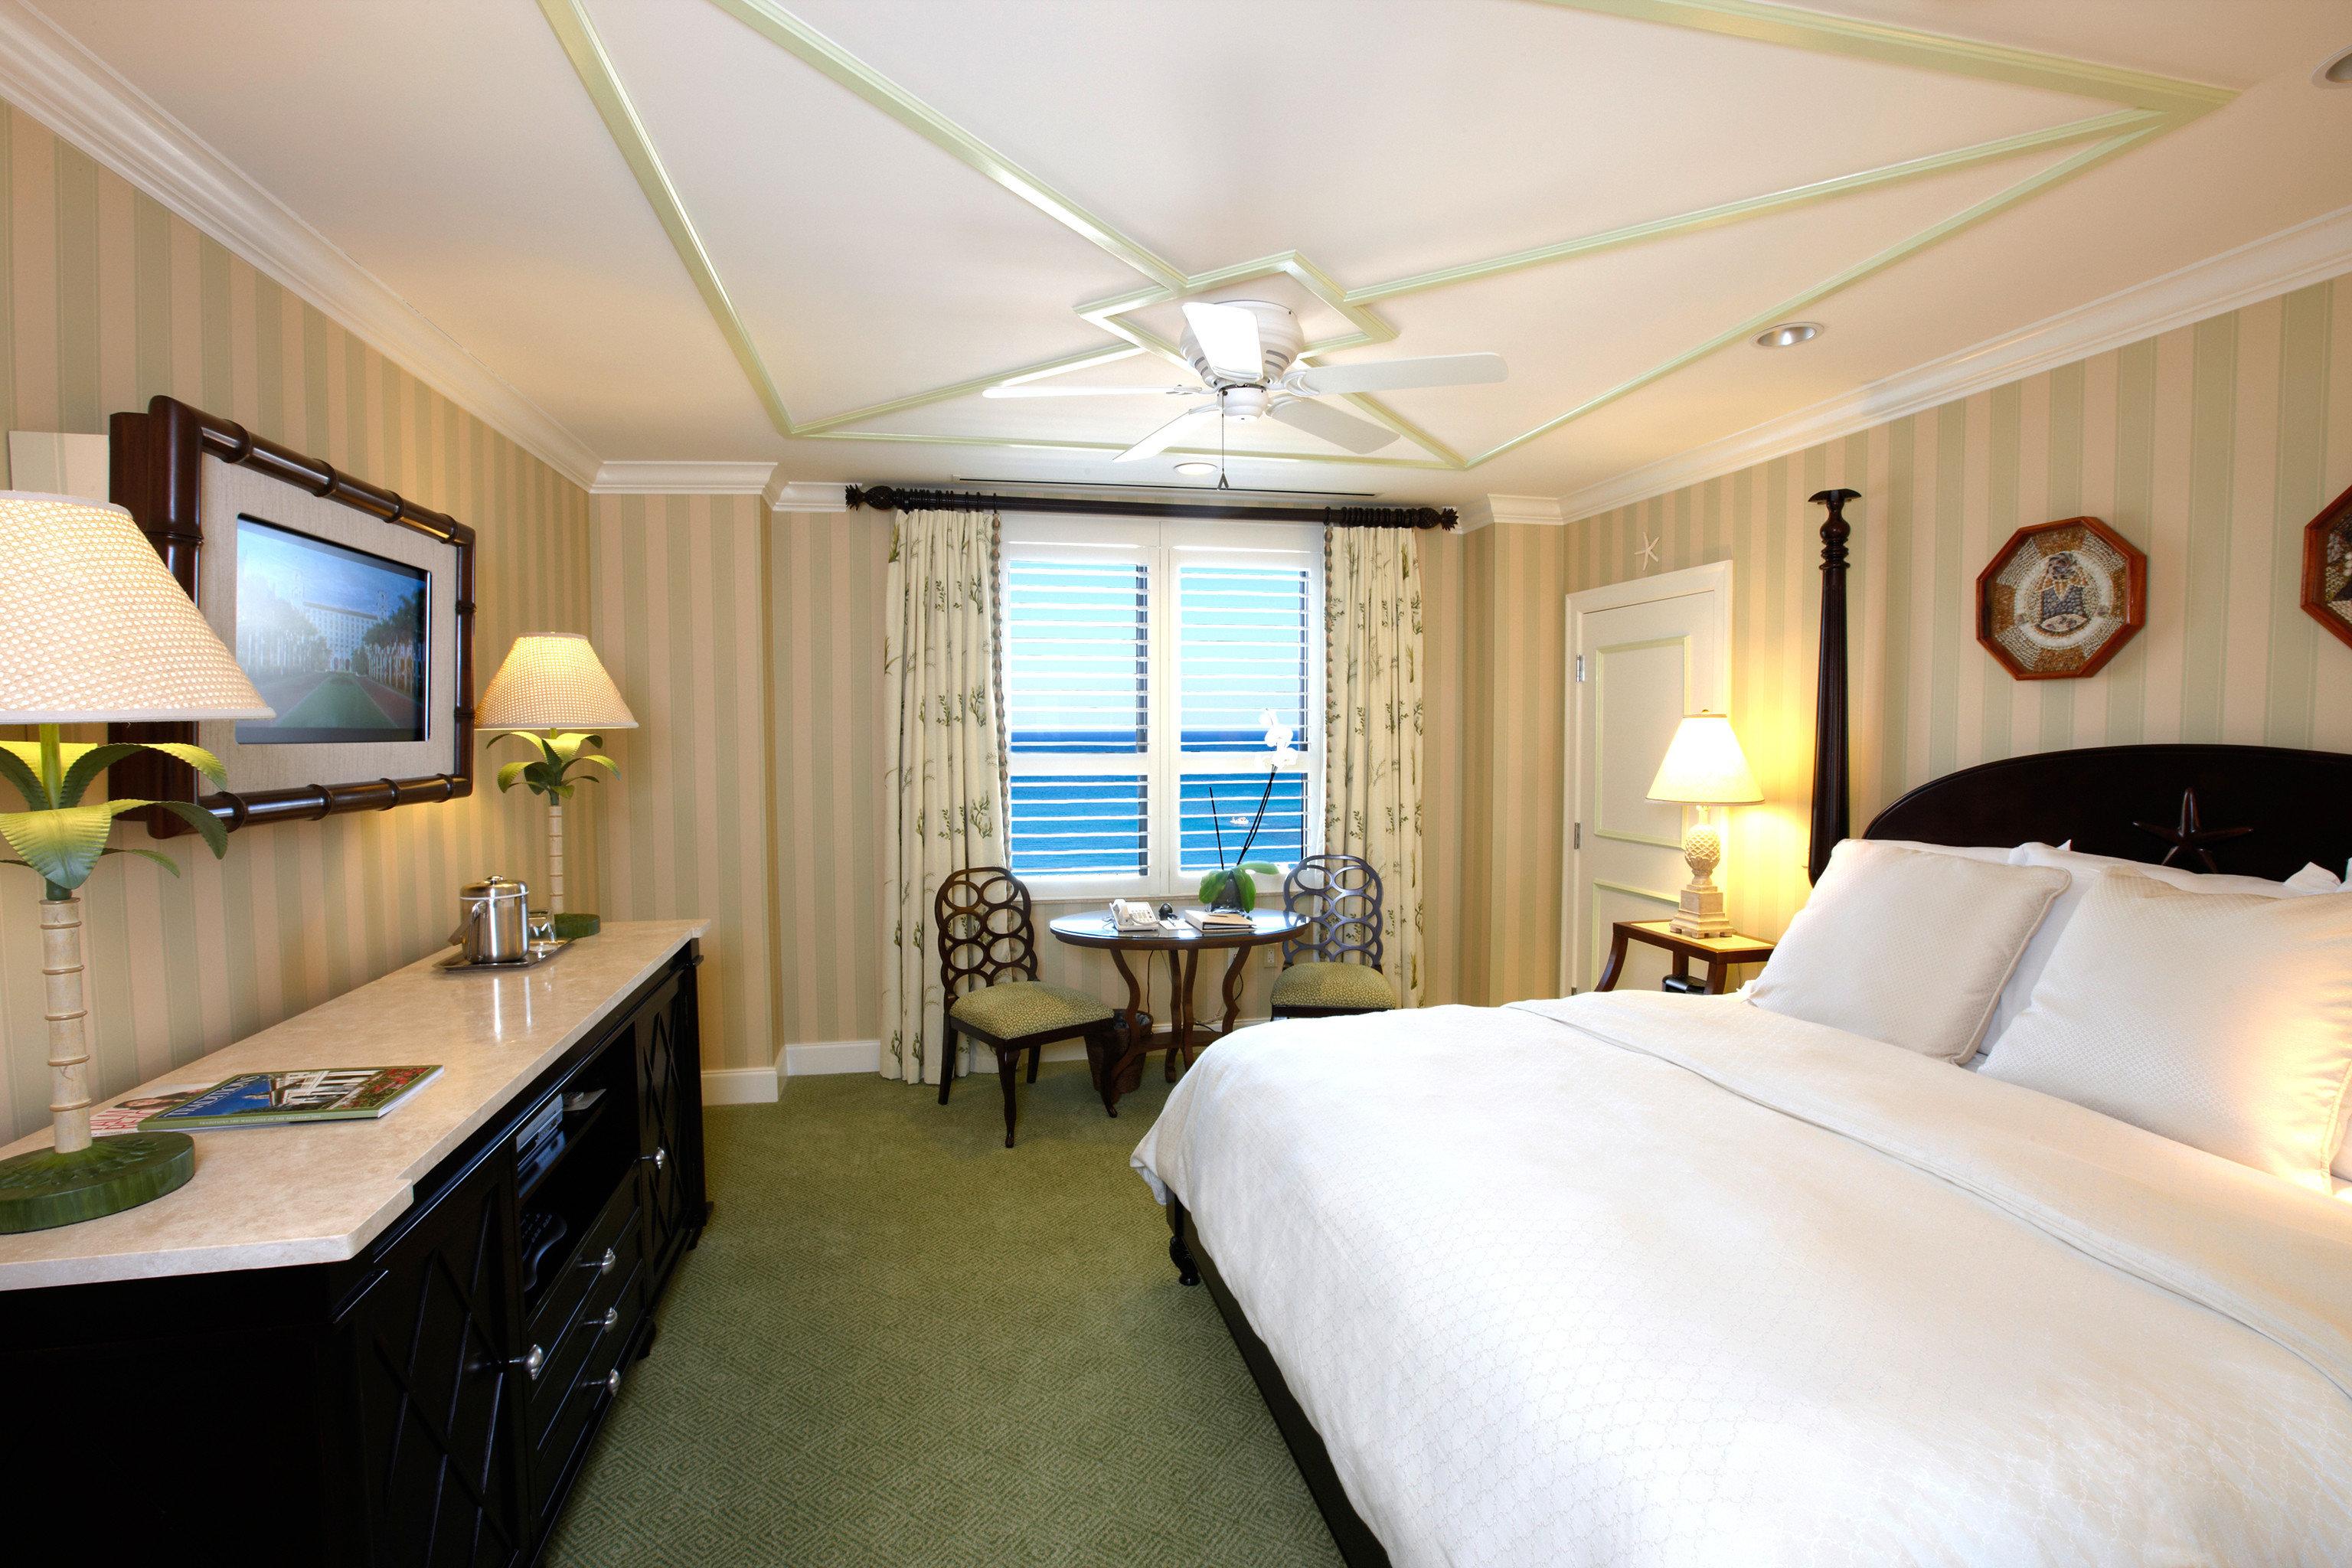 Bedroom Elegant Luxury Suite Trip Ideas property home cottage